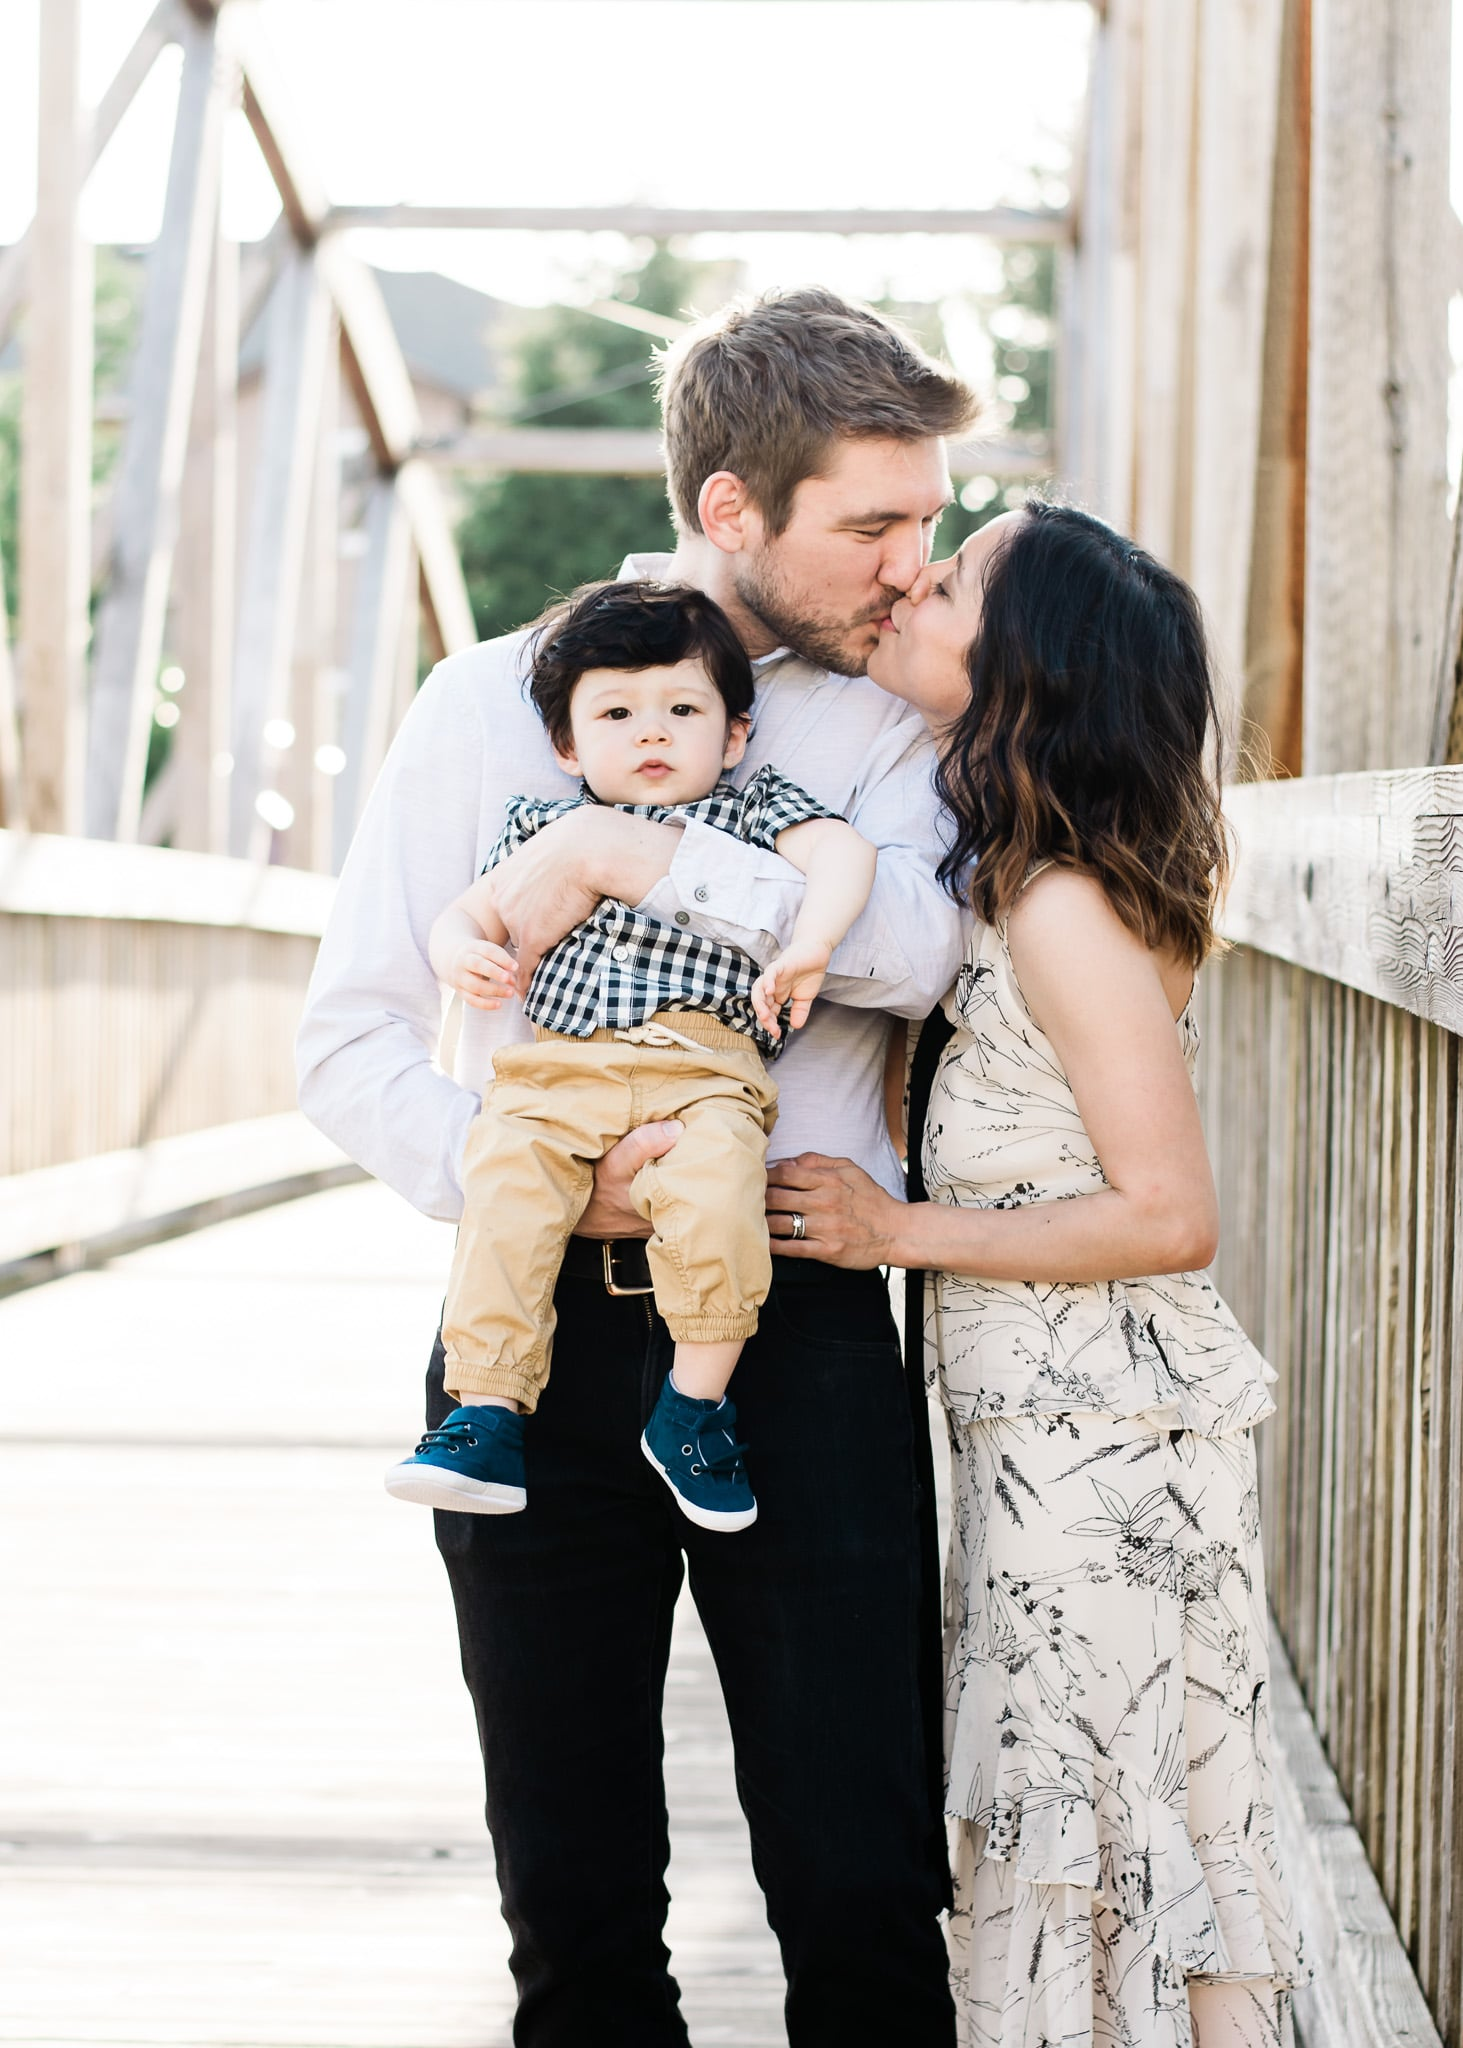 Portland, Oregon family photos, family photography, family photographer in portland oregon, lifestyle family photography, family portraits, portrait photographer | Portland, OR Photographer